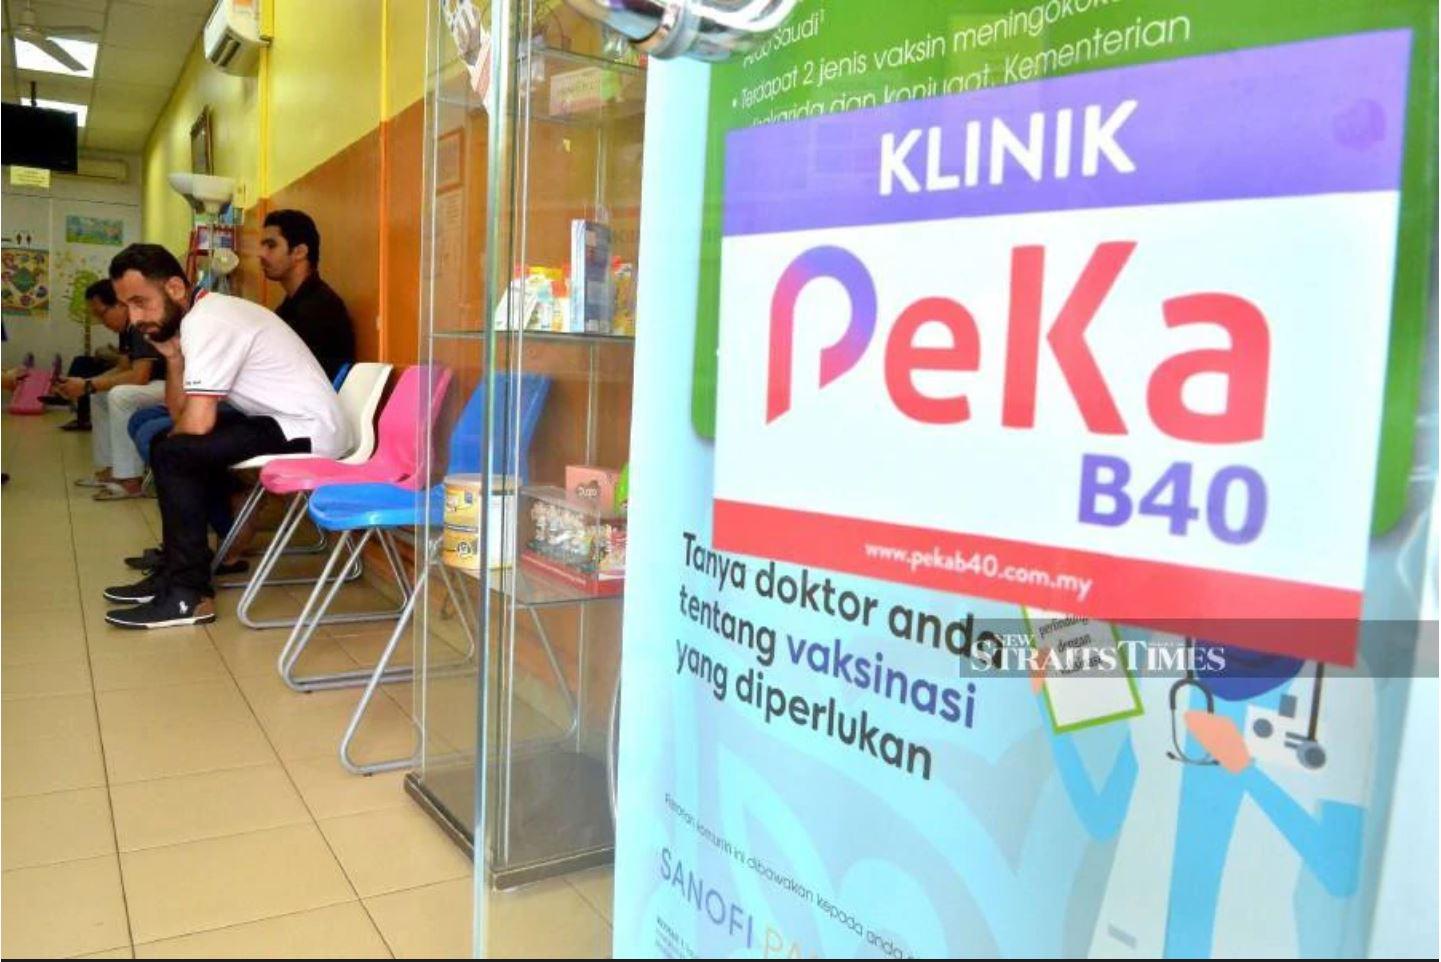 PeKa B40 well-received in Sarawak